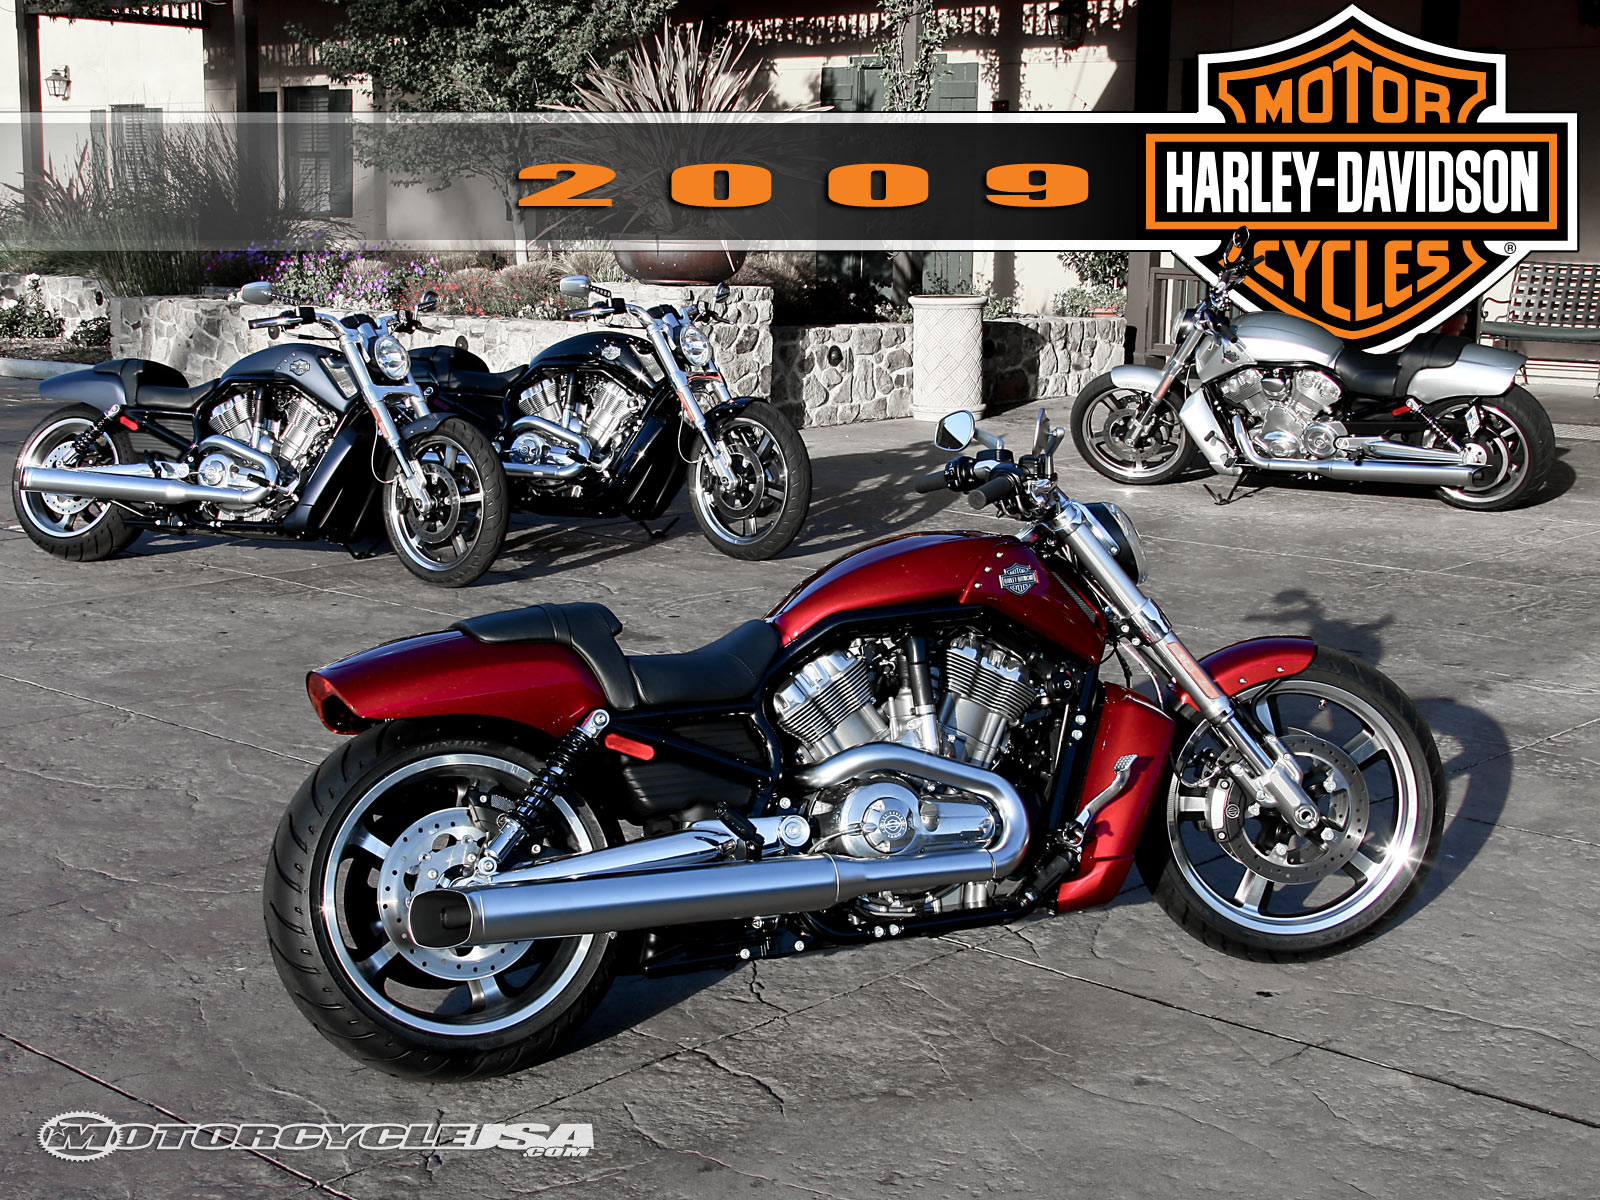 Motorcycles harley davidson wallpaper collection 3 harley davidson harley davidson hd voltagebd Gallery